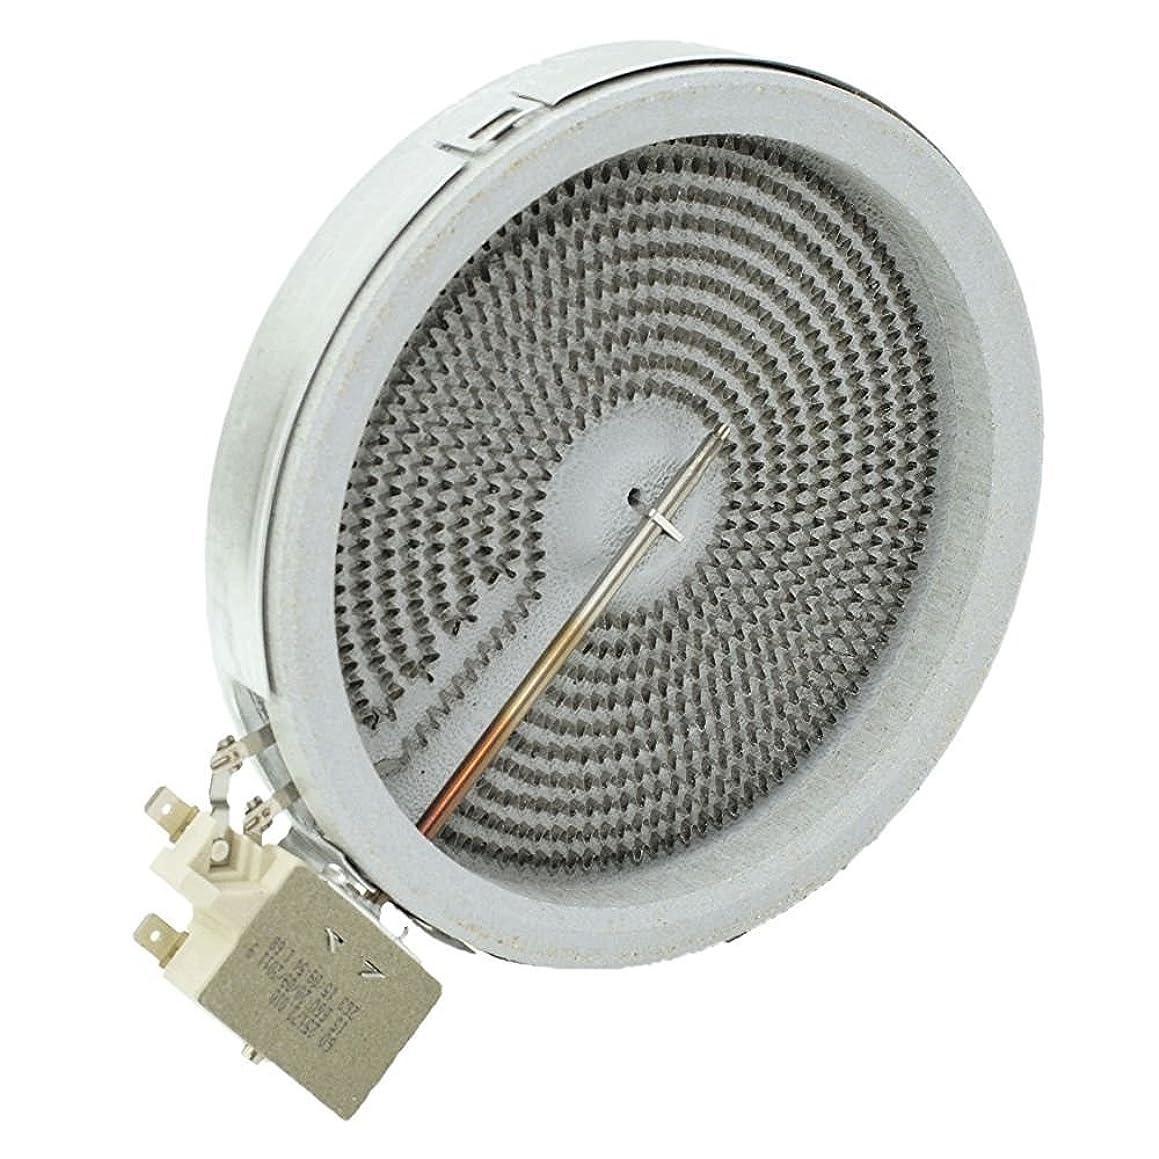 Whirlpool Part Number 8273994: ELEMENT (RR. LR)